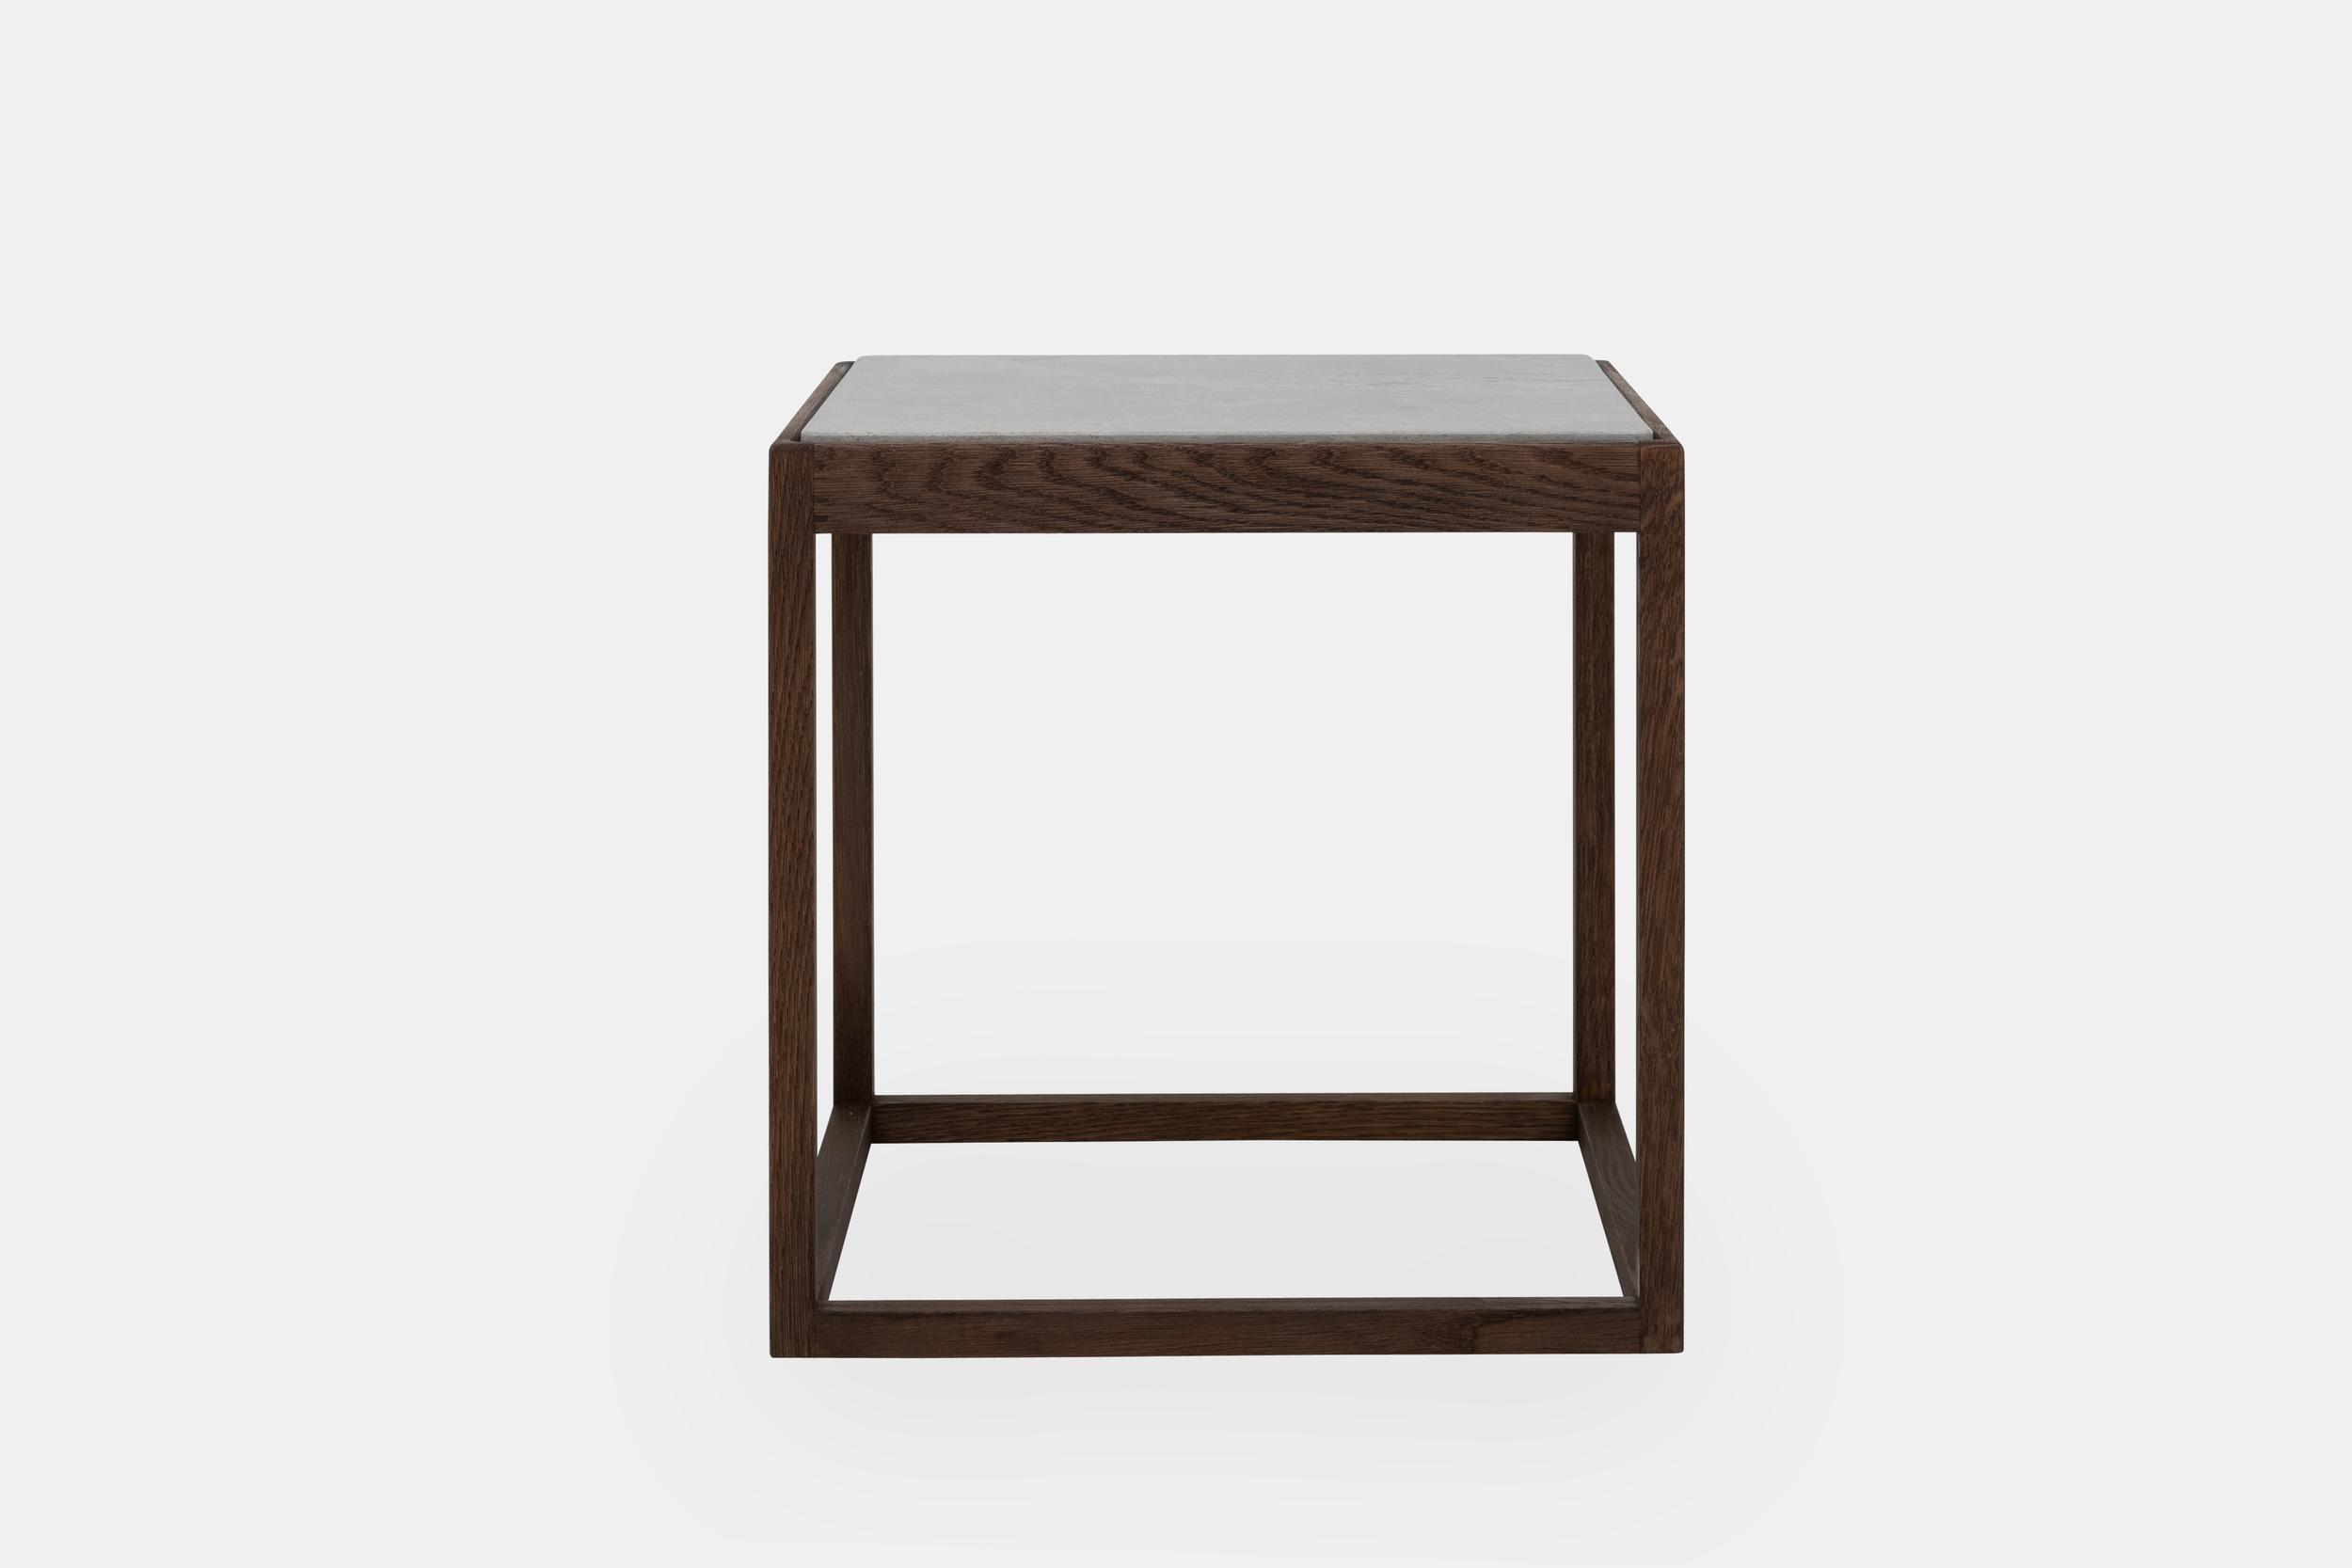 Klassik Studio Cube - Smoked Oak/Light Grey Marble